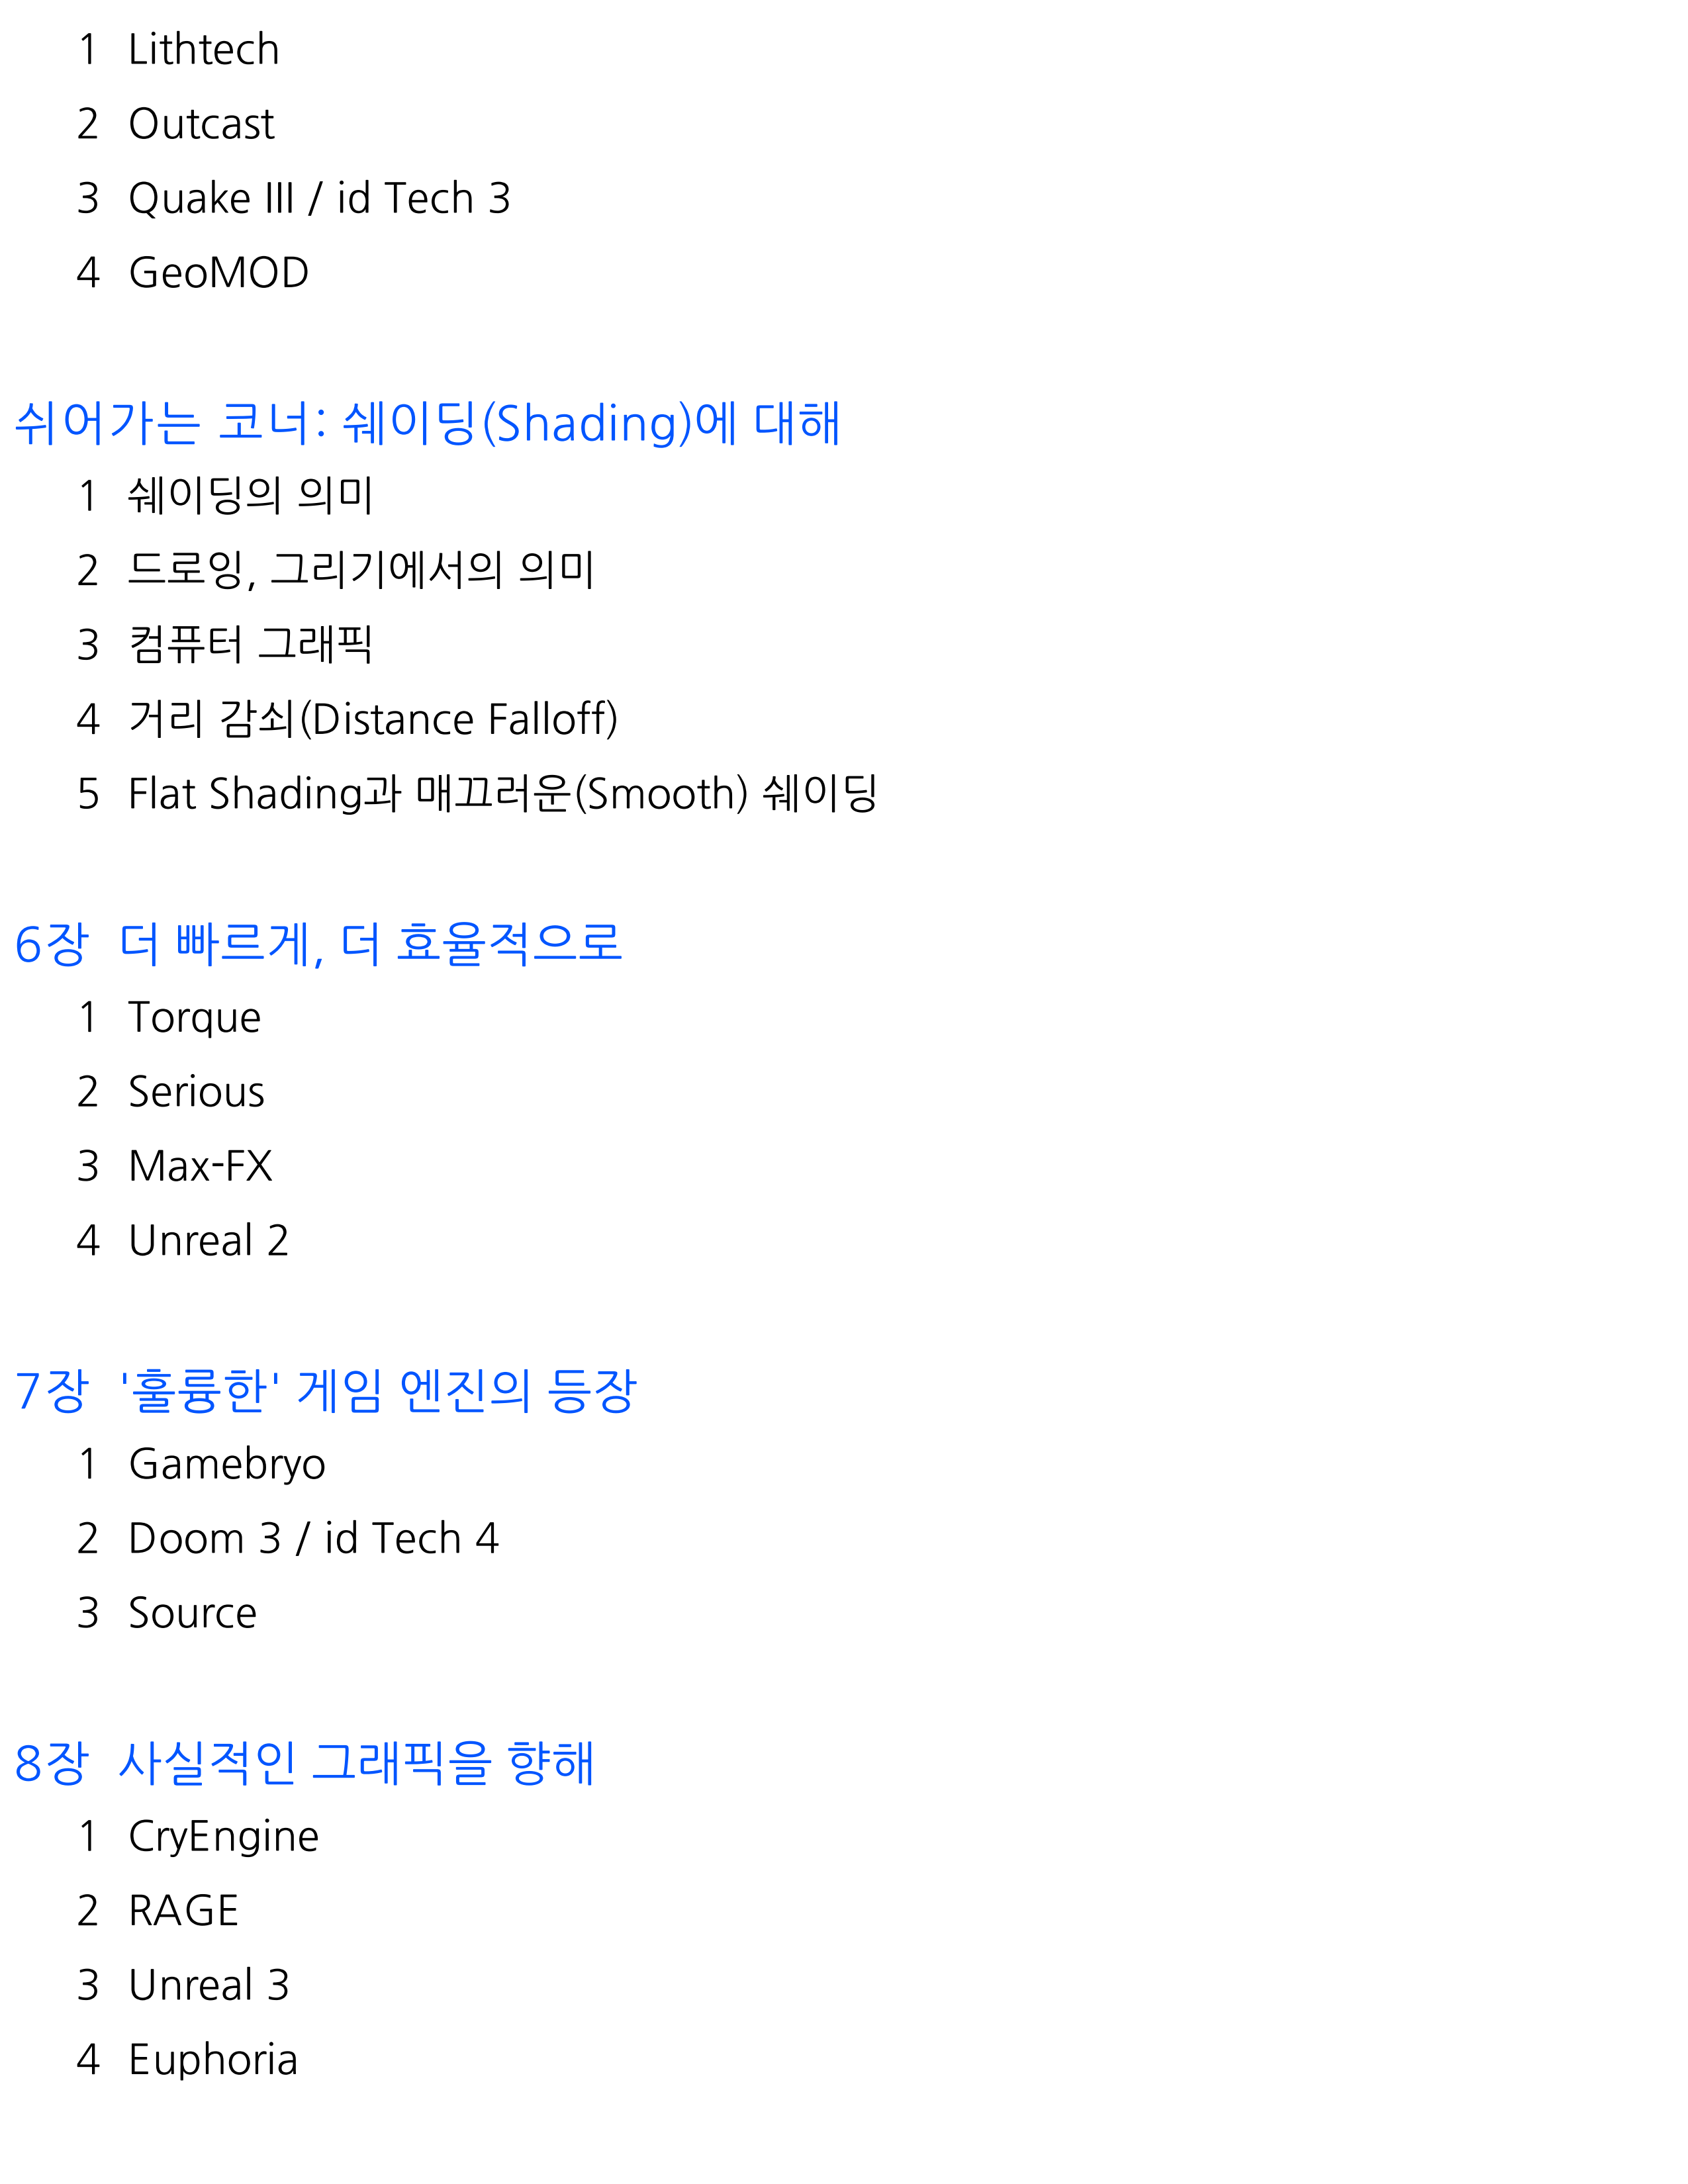 3D geim enjin, eoddeohge baljeo - jeonhyeonseog_04